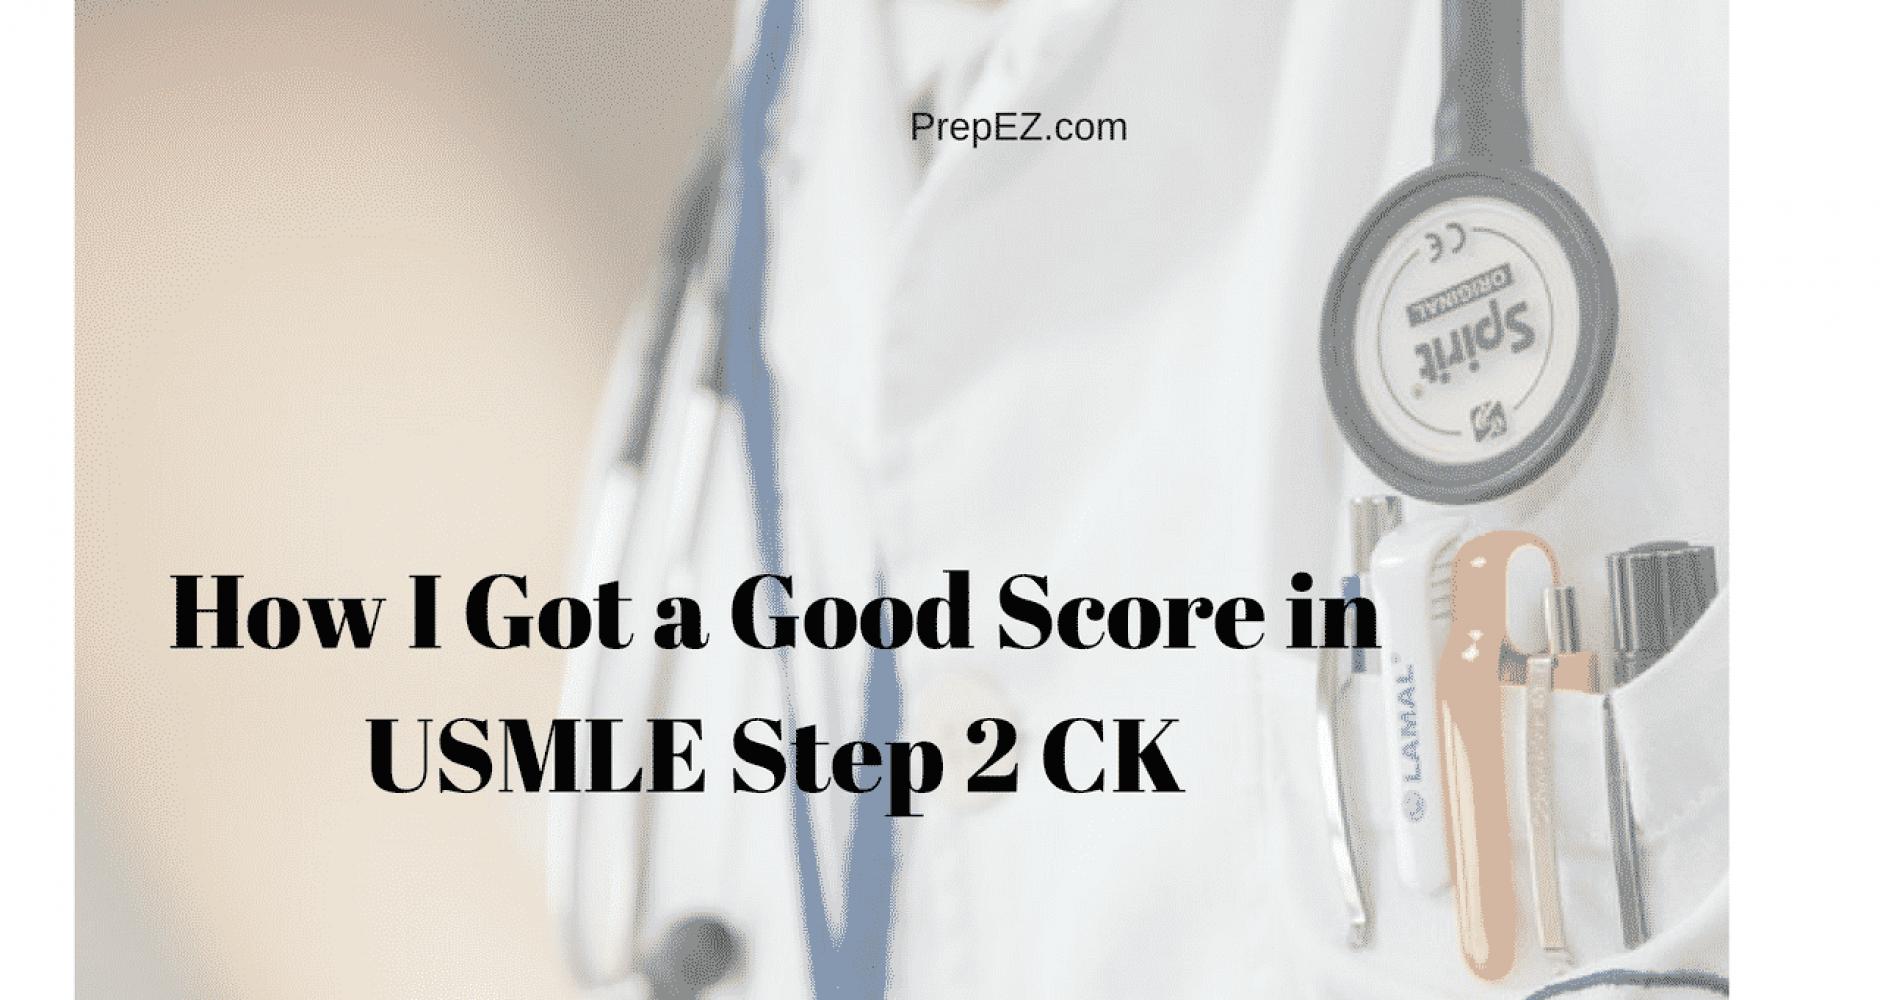 How I Got a Good Score in USMLE Step 2 CK - PrepEZ